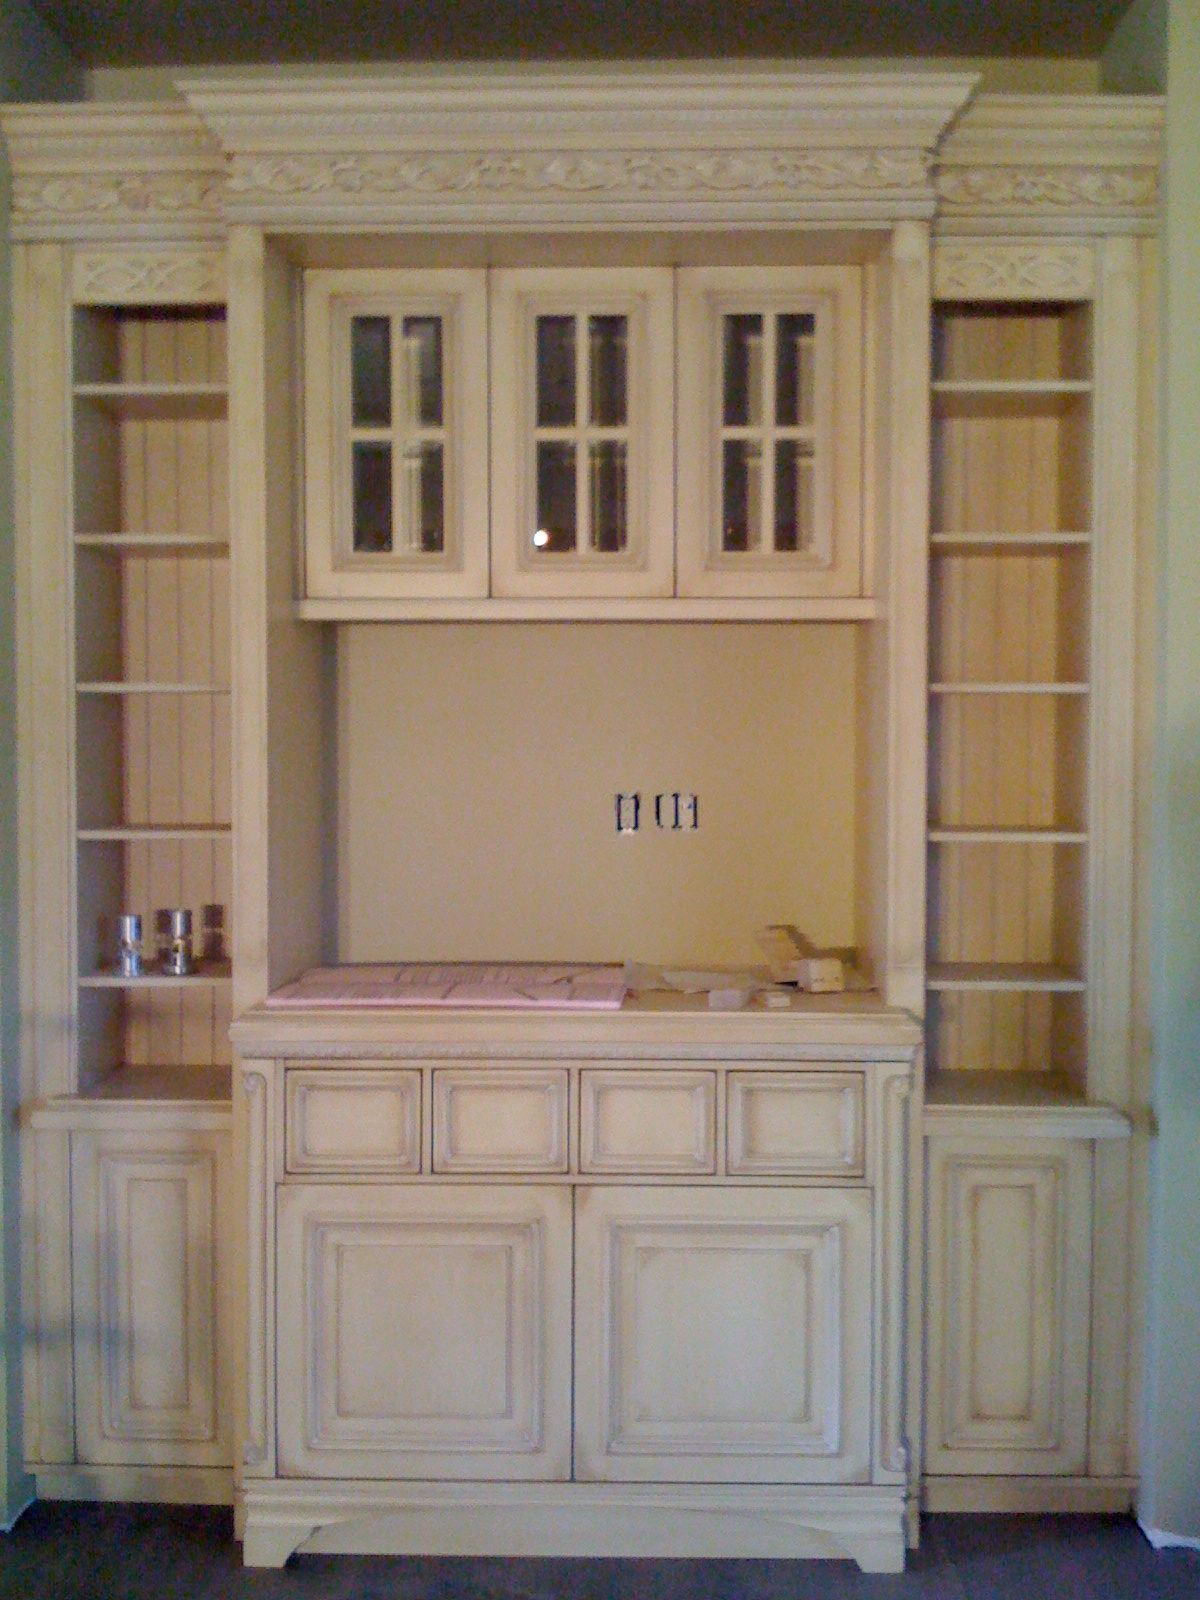 Wm Ohs cabinets, Denver Work in progress | Home decor, Design